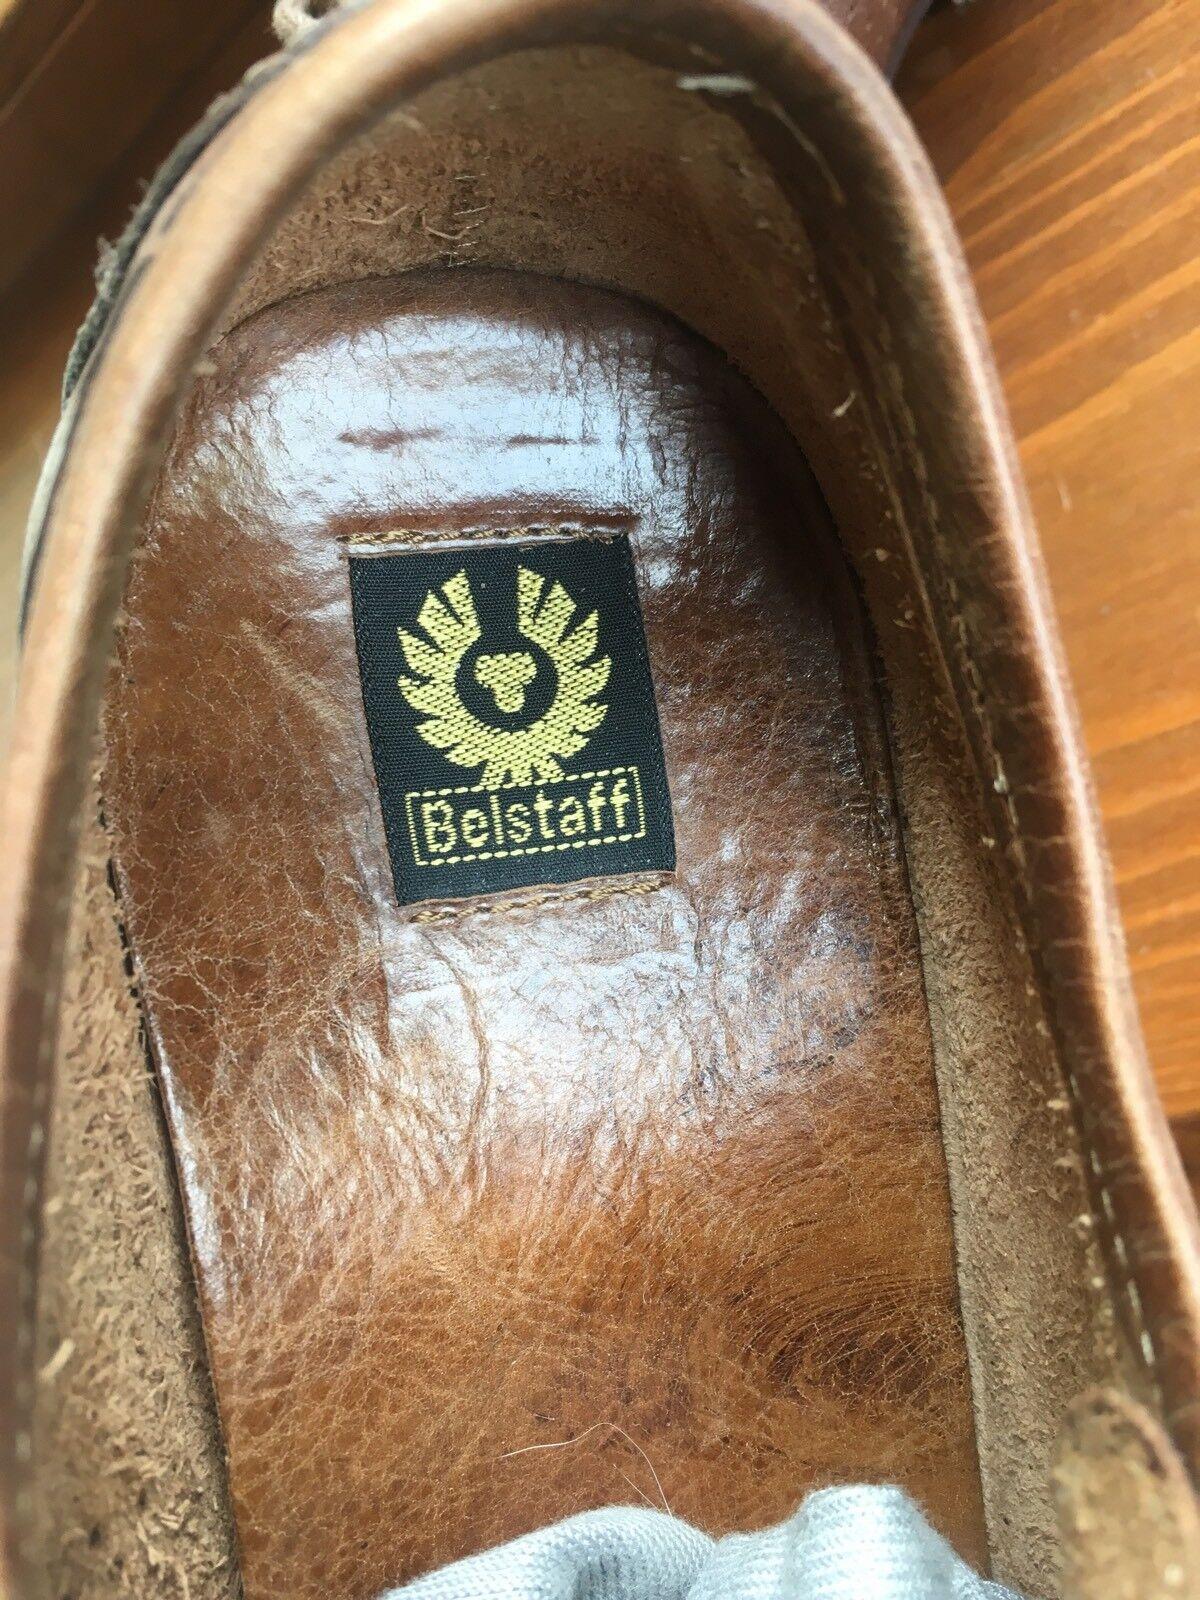 BELSTAFF Leather Driving scarpe Ventilated Lace Up Scarpe Basse Stringate Stringate Stringate Pelle   Shop  18aa9b